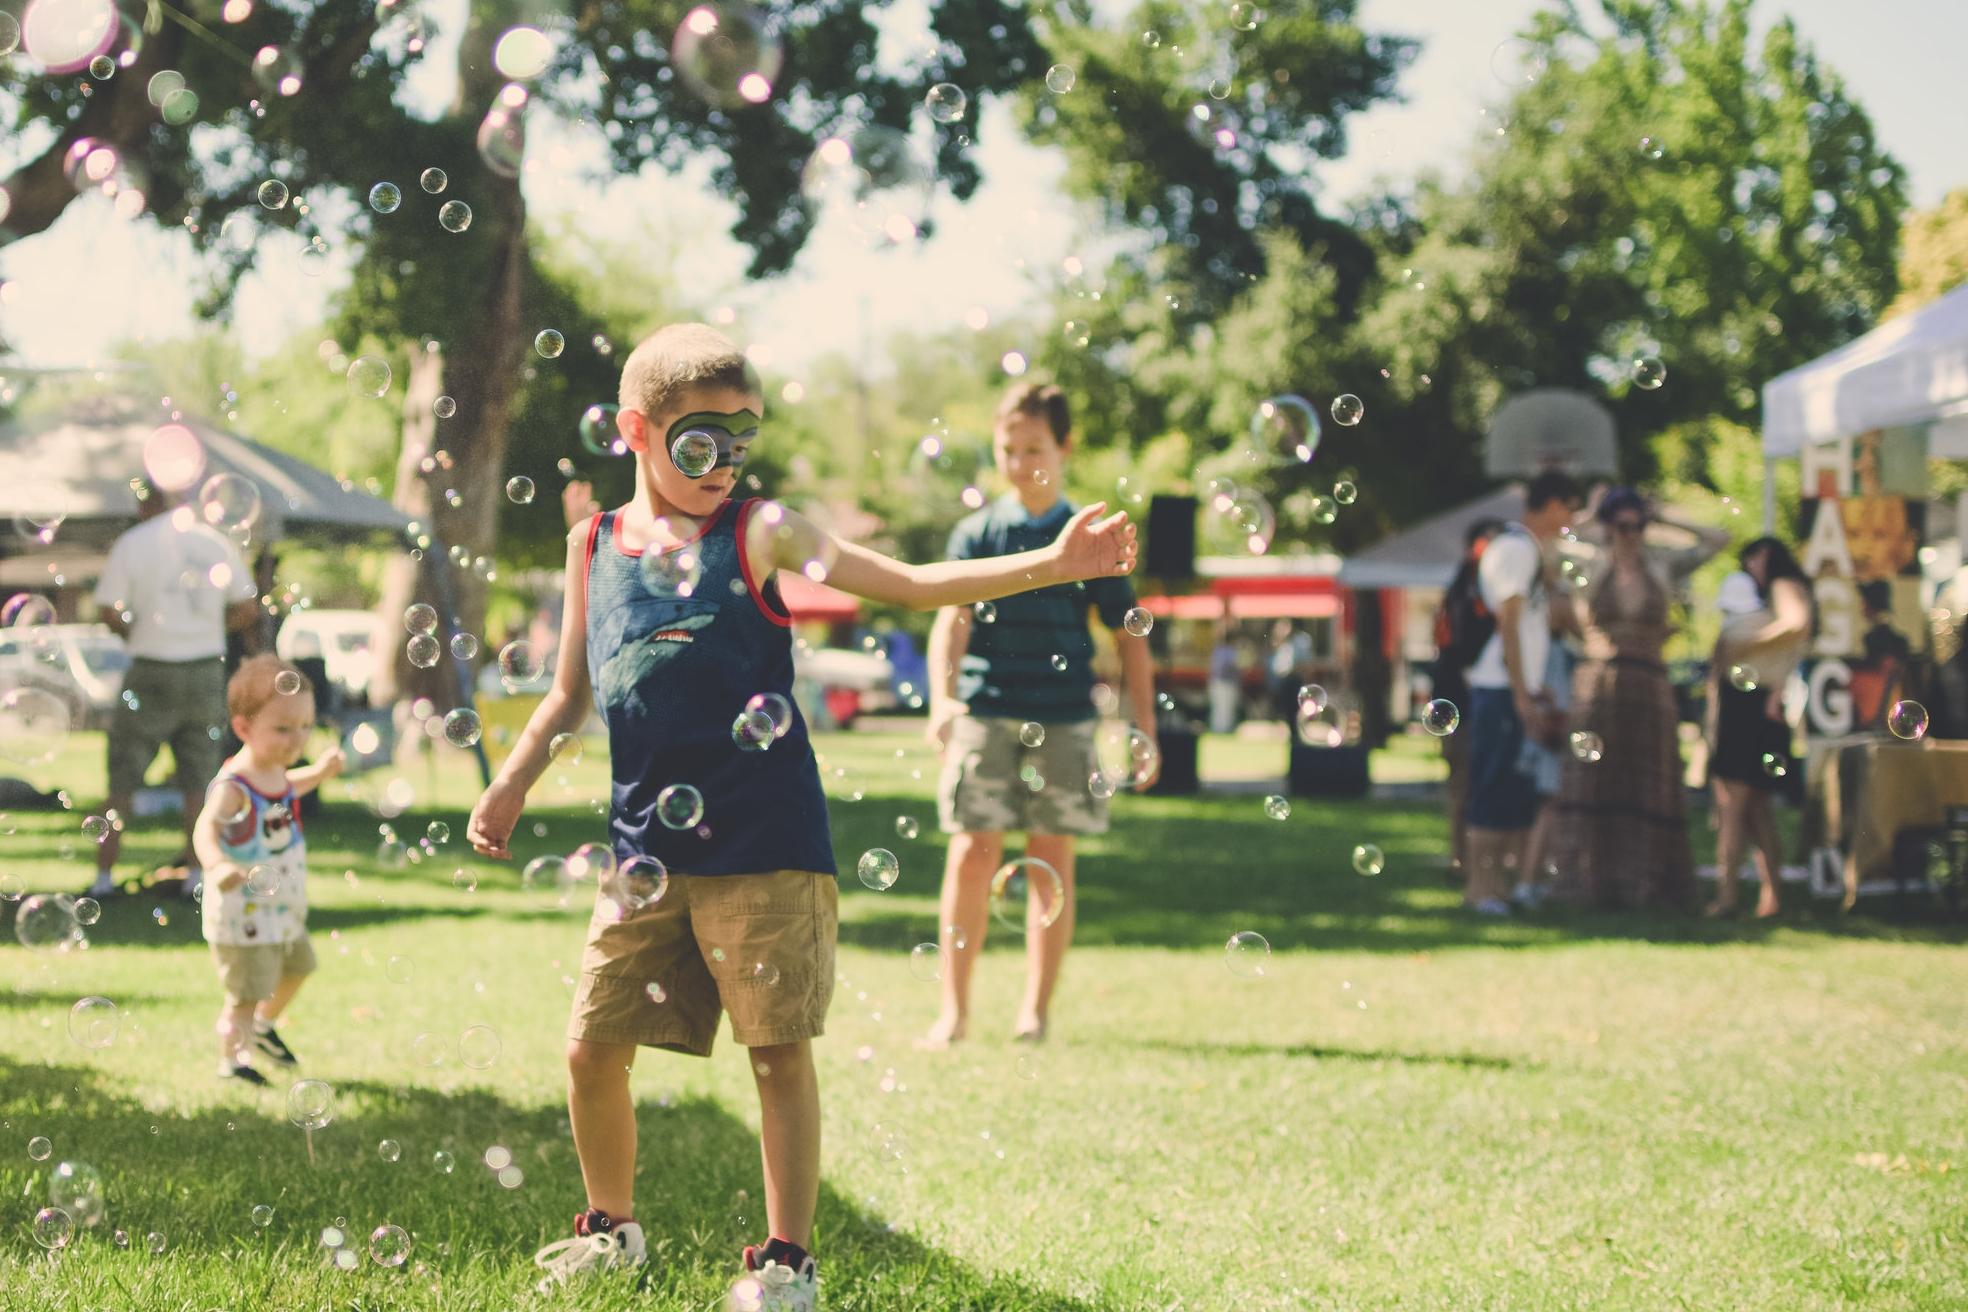 Bubbles Dancing Kid Park Festival Summer Fair